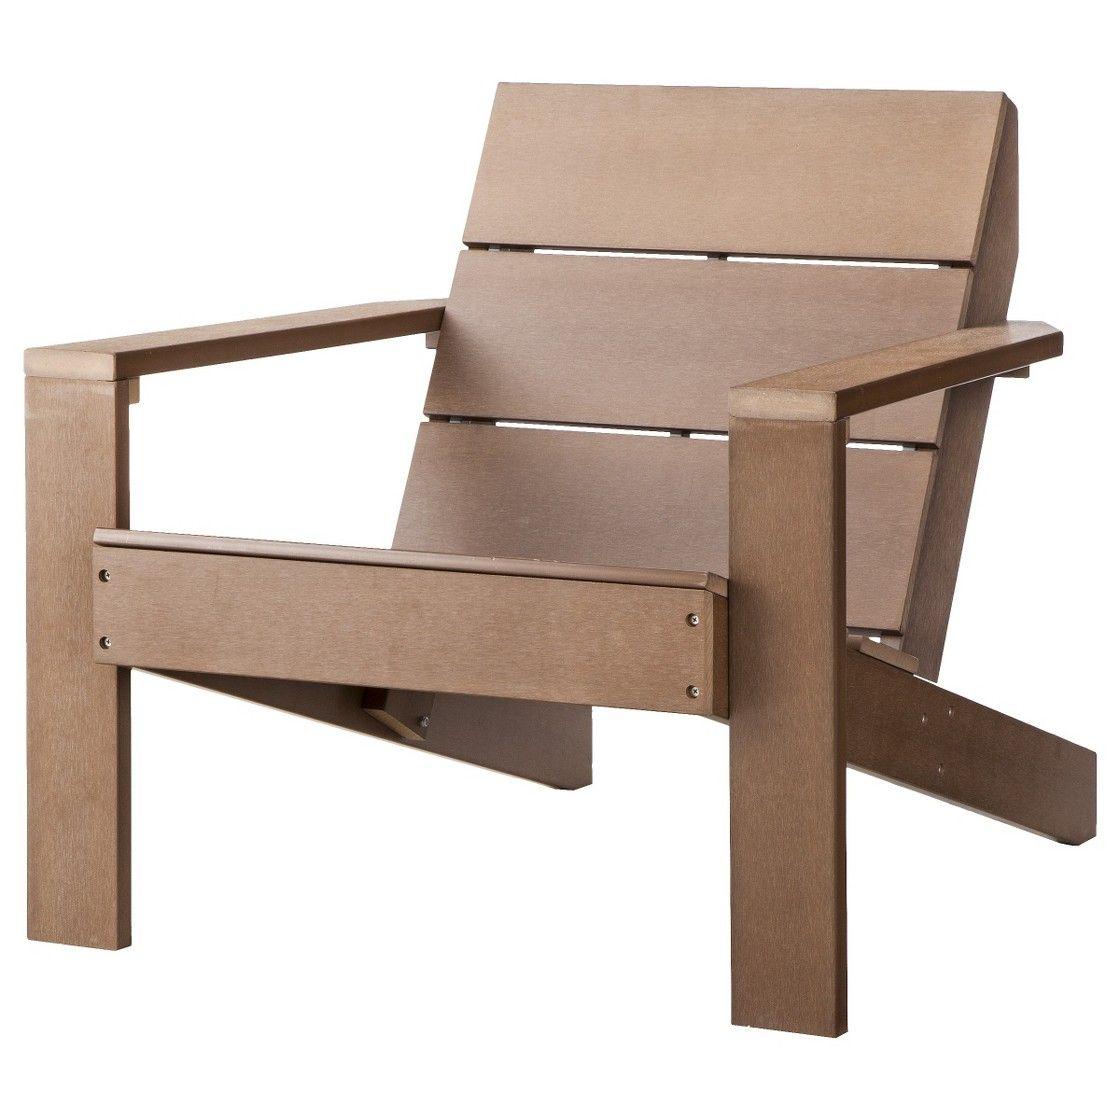 Threshold Bryant Faux Wood Patio Adirondack Chair Brown Patio Furniture Collection Adirondack Chairs Patio Wood Adirondack Chairs